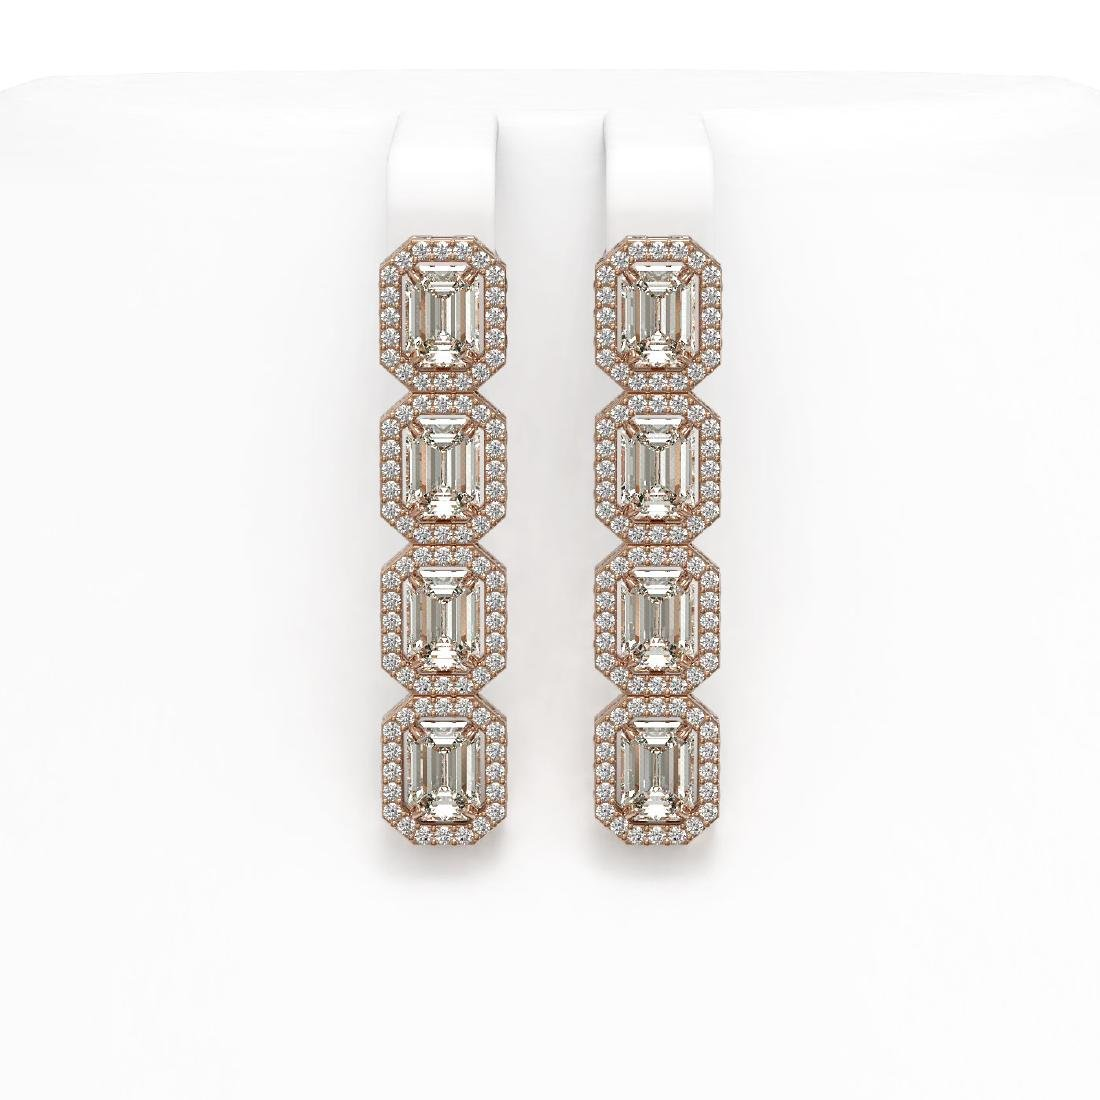 6.08 CTW Emerald Cut Diamond Designer Earrings 18K Rose